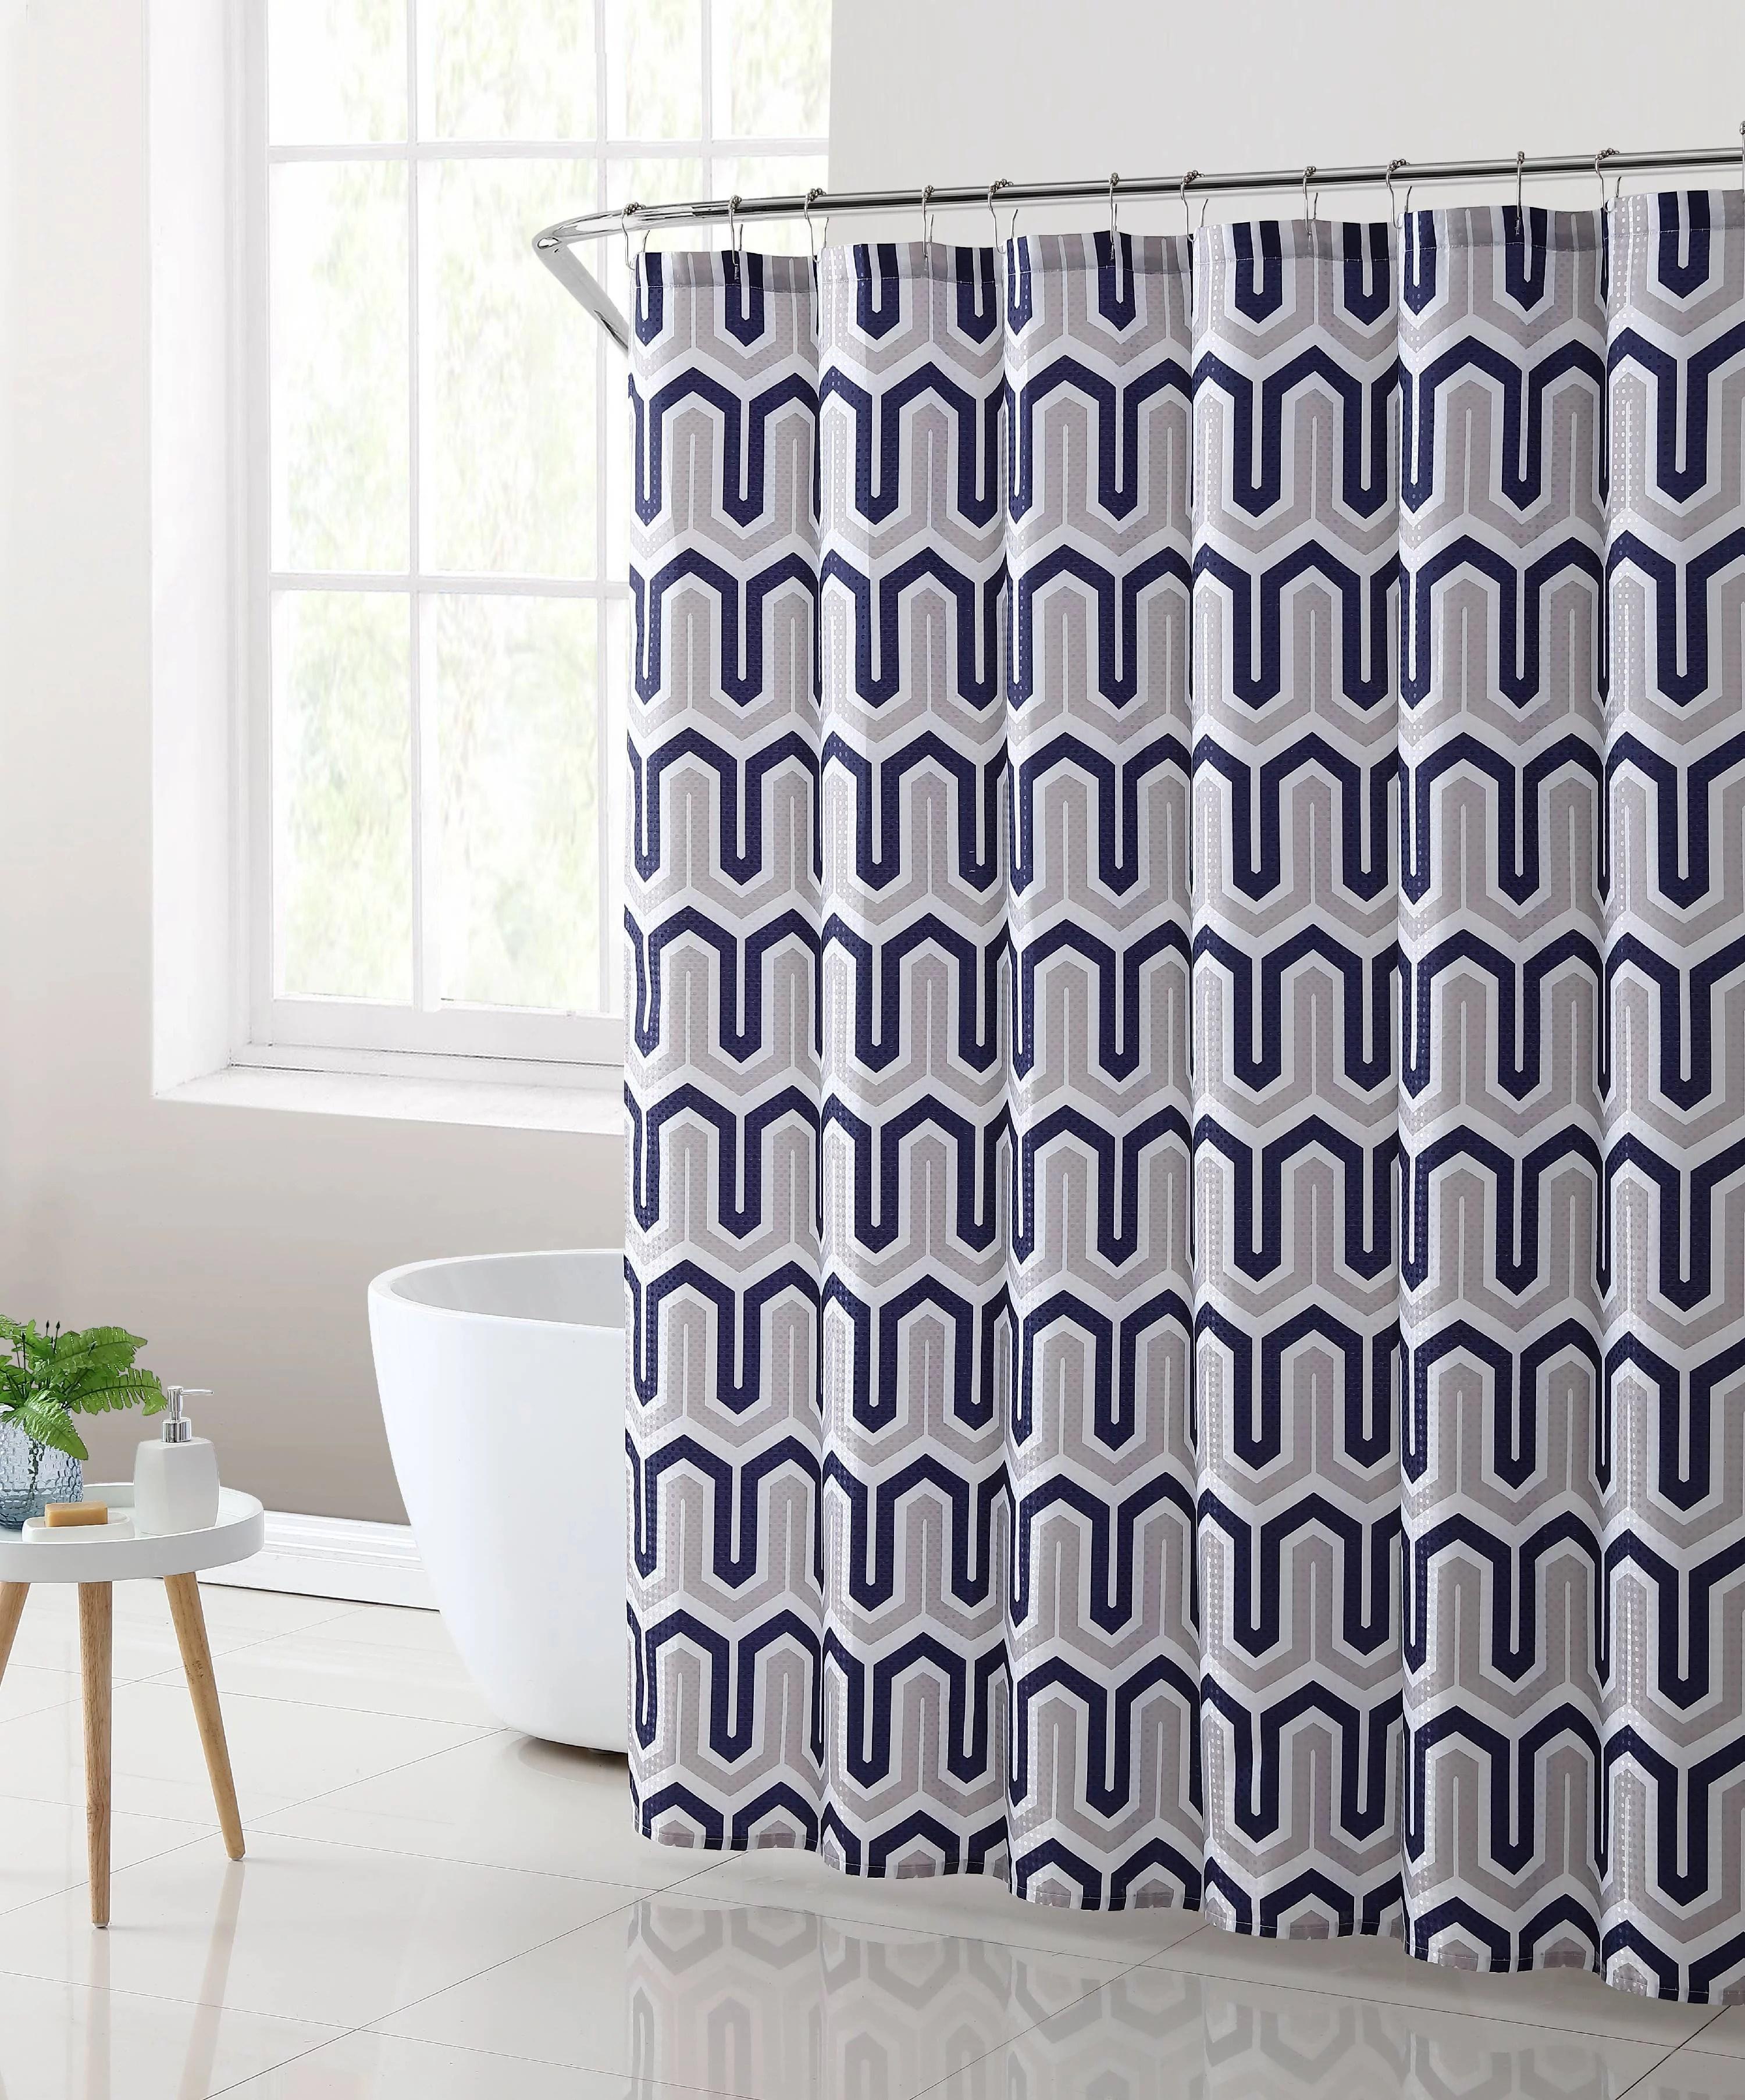 mainstays london geometric fabric shower curtain